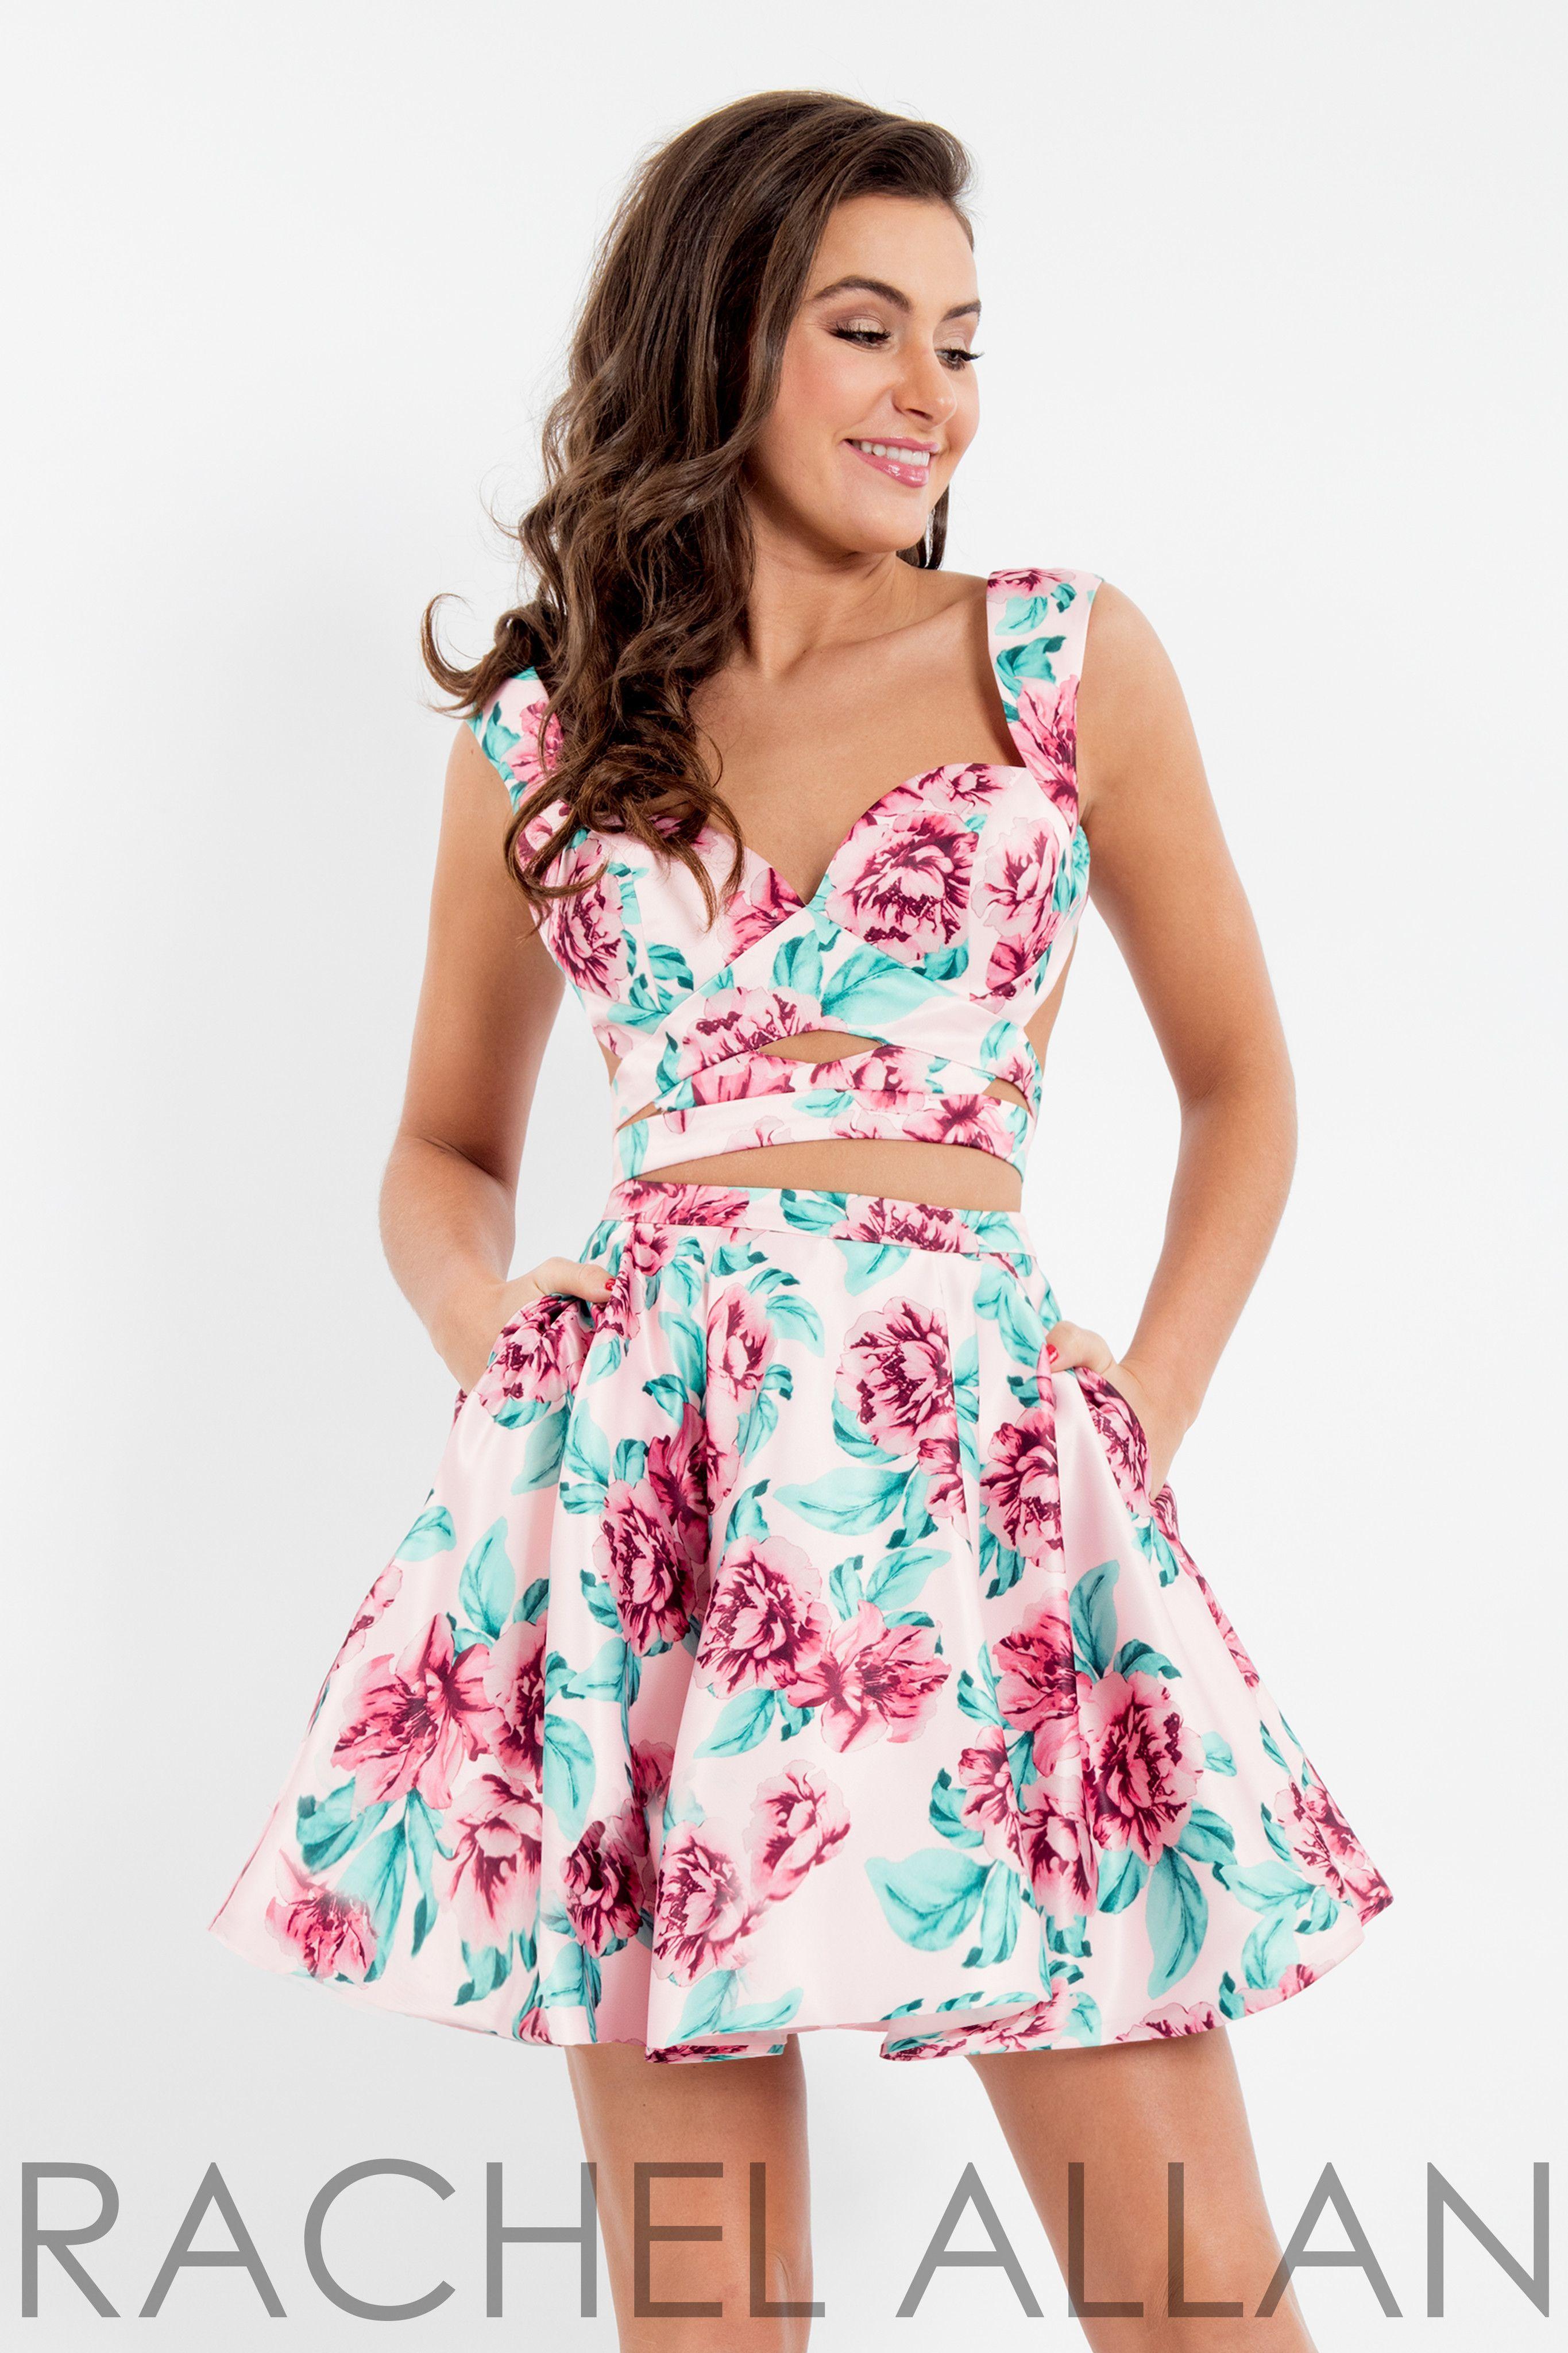 Rachel Allan 4491 Blush Print Sweetheart Two Piece Short Dress ... cee22aadb